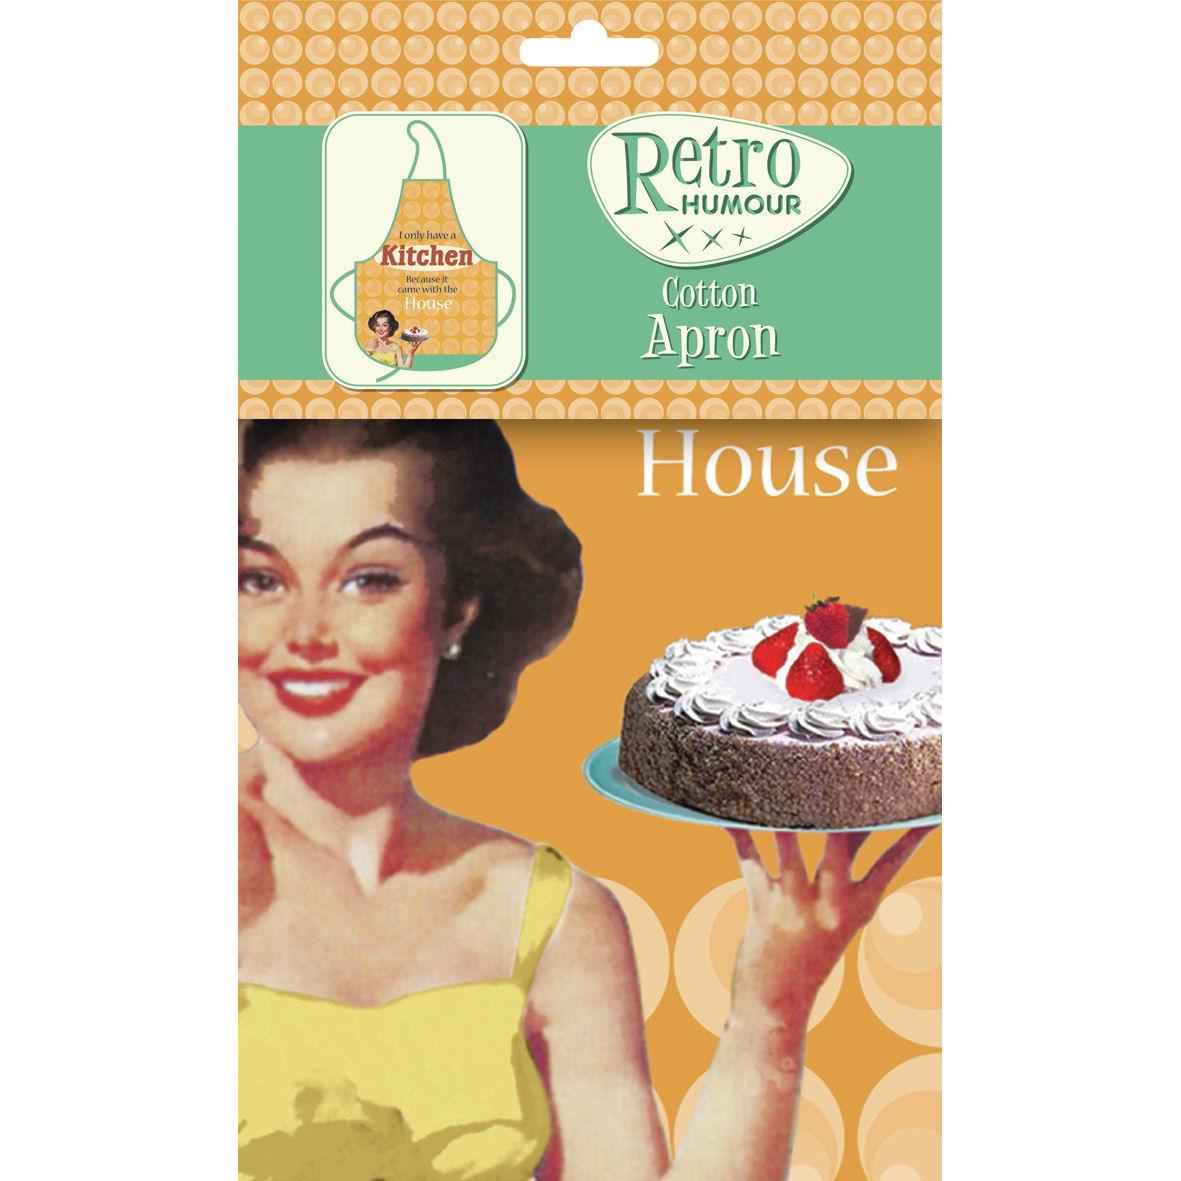 Retro Kitchen Aprons: NEW RETRO HOUSEWIFE KITCHEN APRON VINTAGE 50s NOVELTY